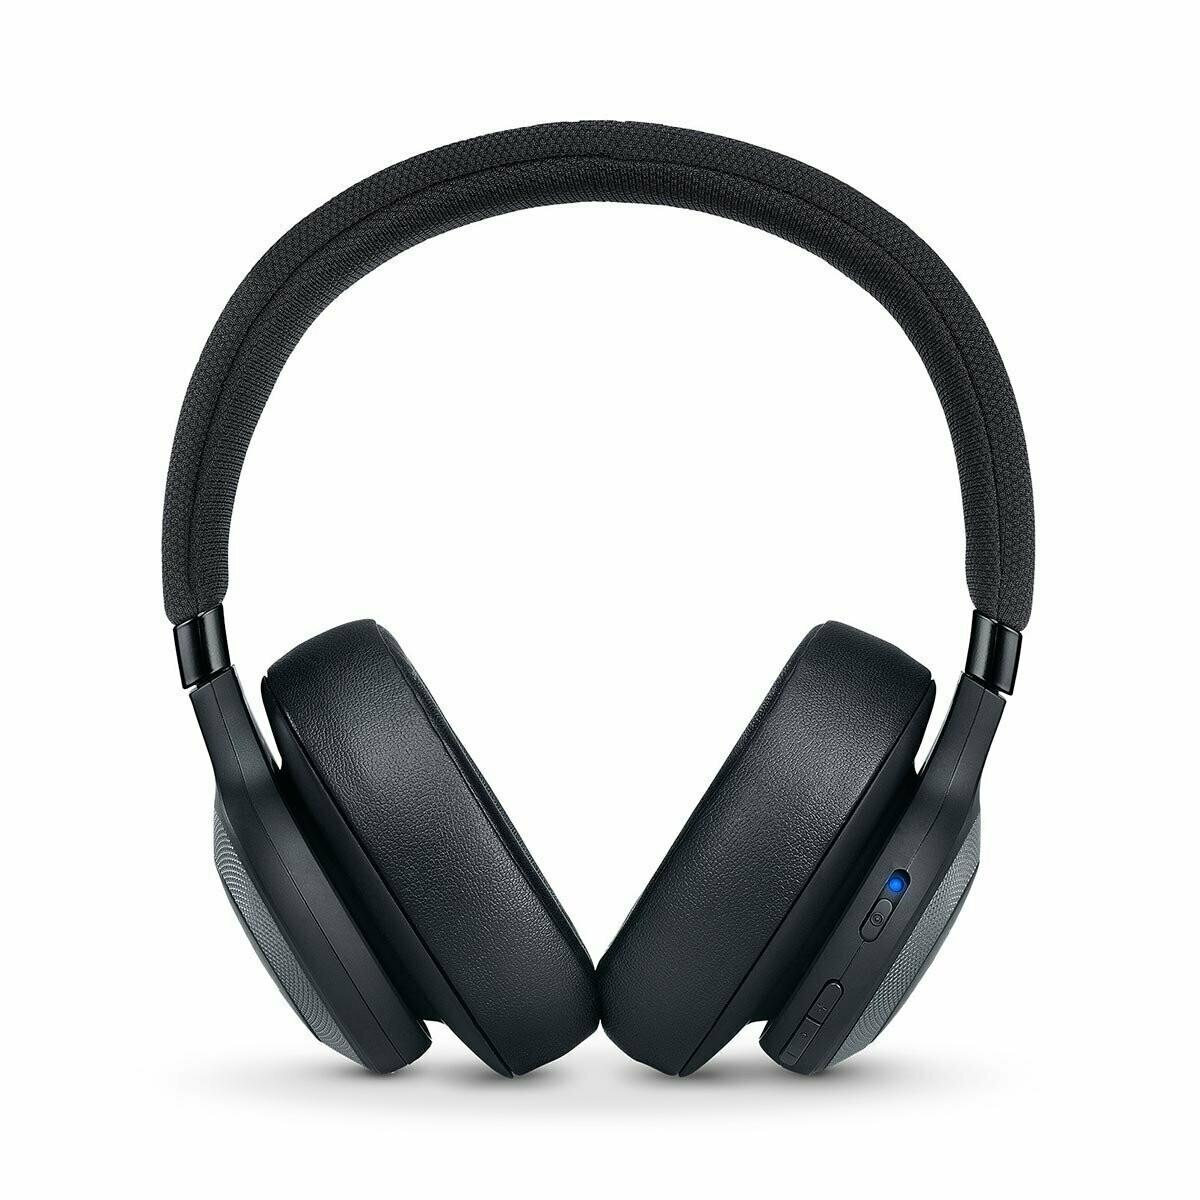 JBL E65BTNC Wireless Active Noise Cancelling Headphones, Black